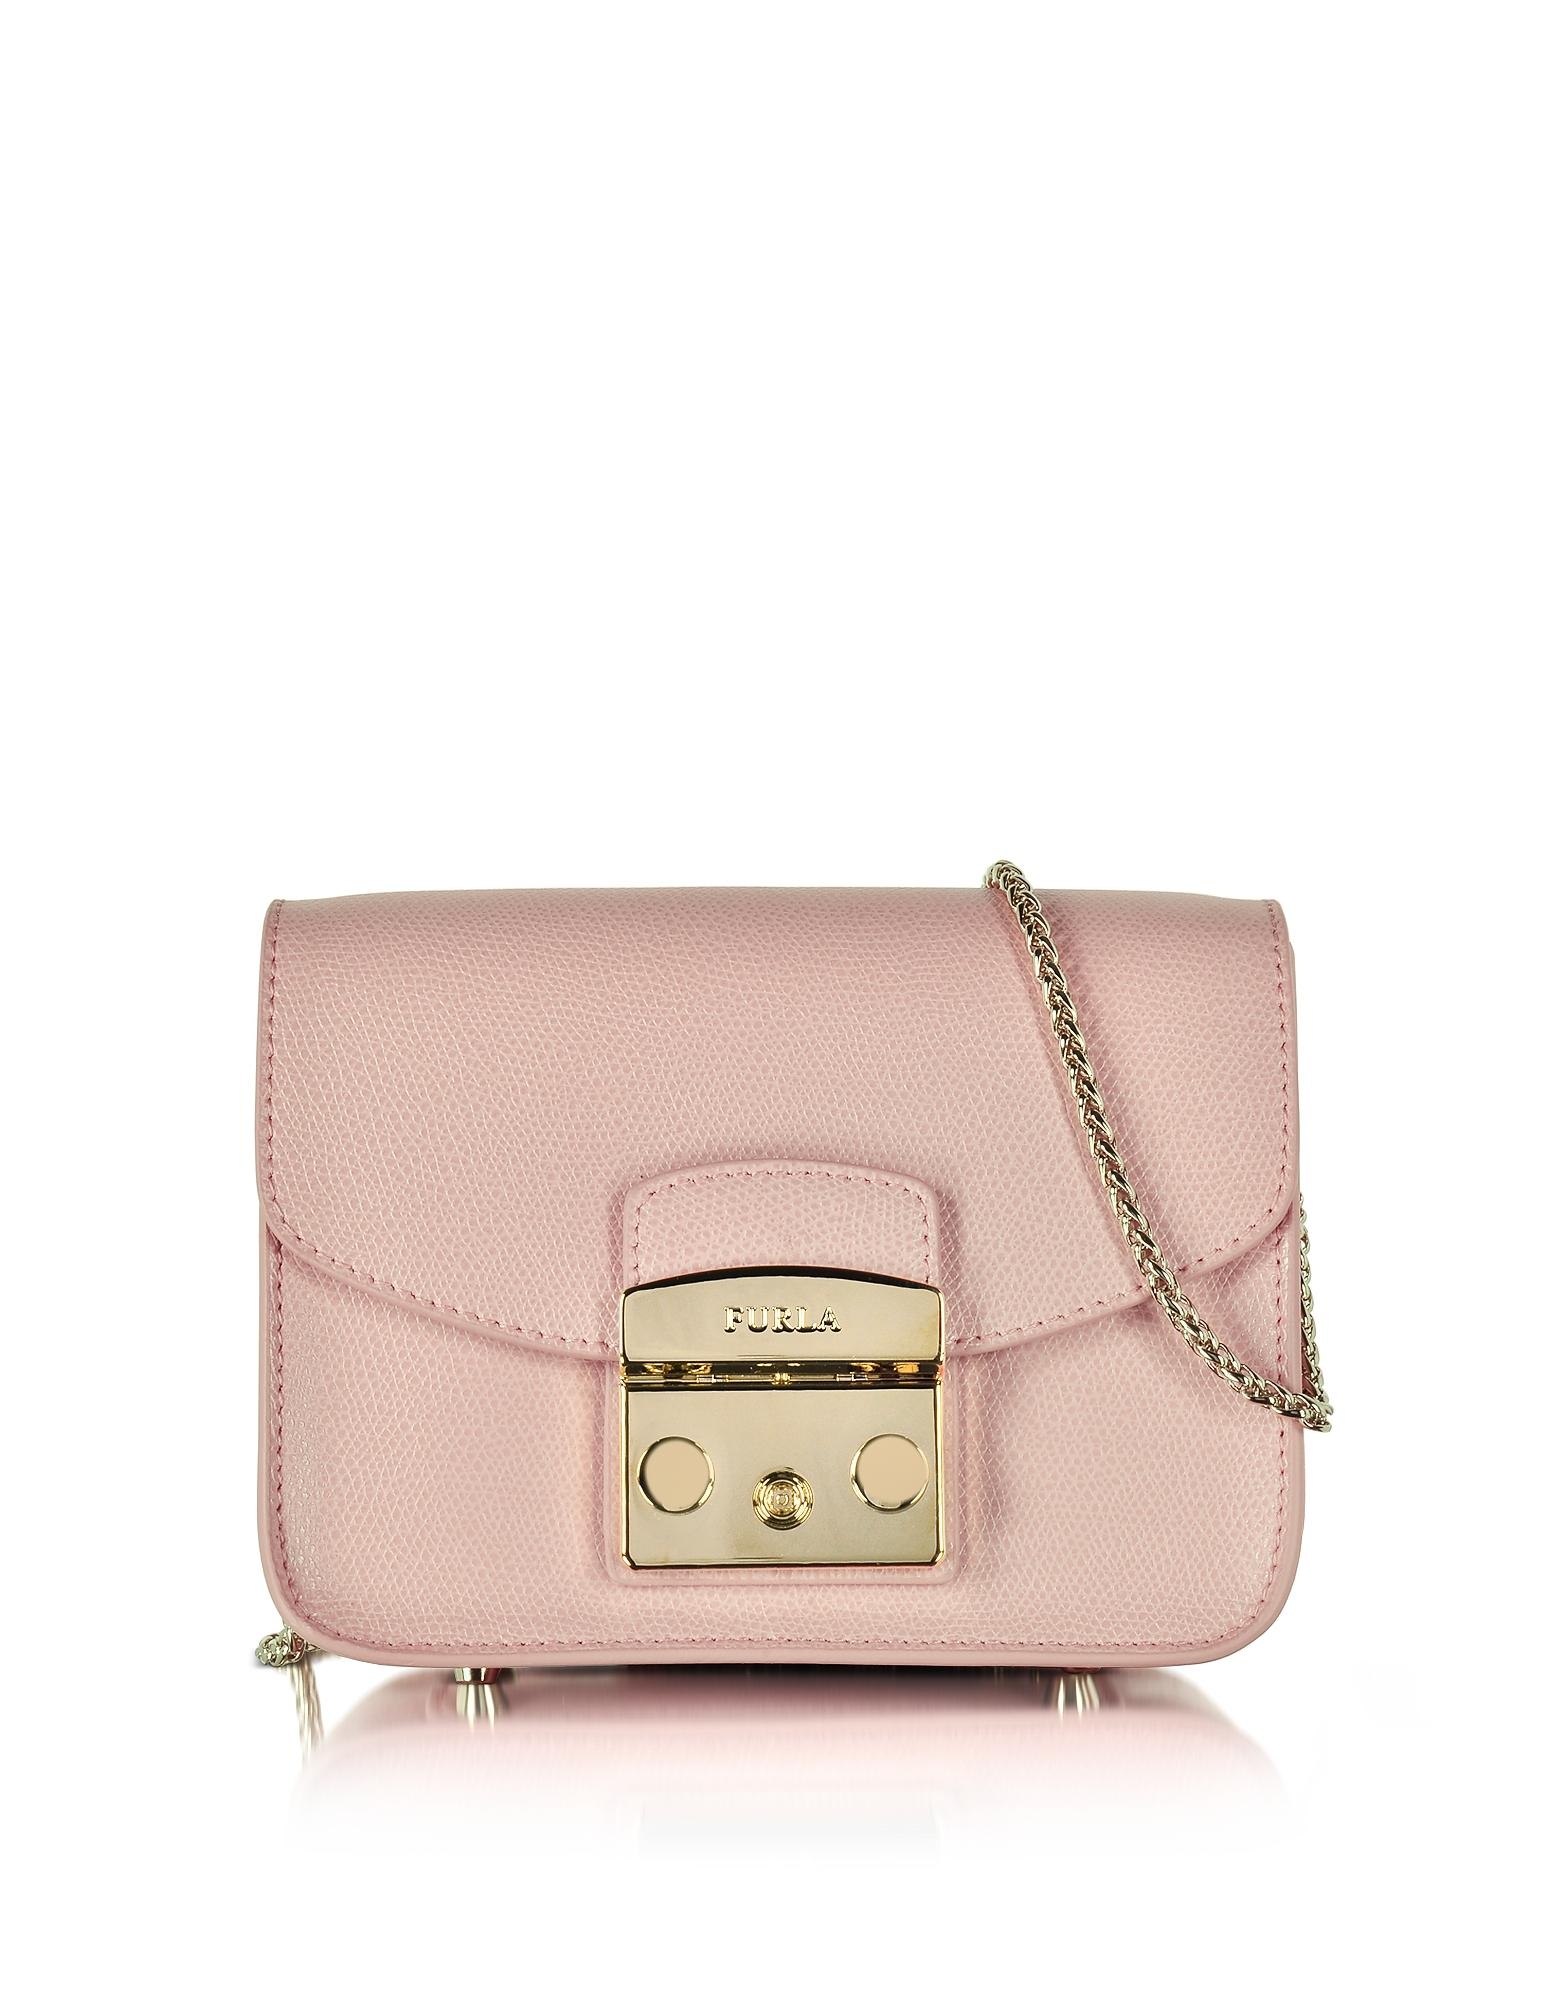 Furla Metropolis Mini Crossbody, Color Corallo: Handbags